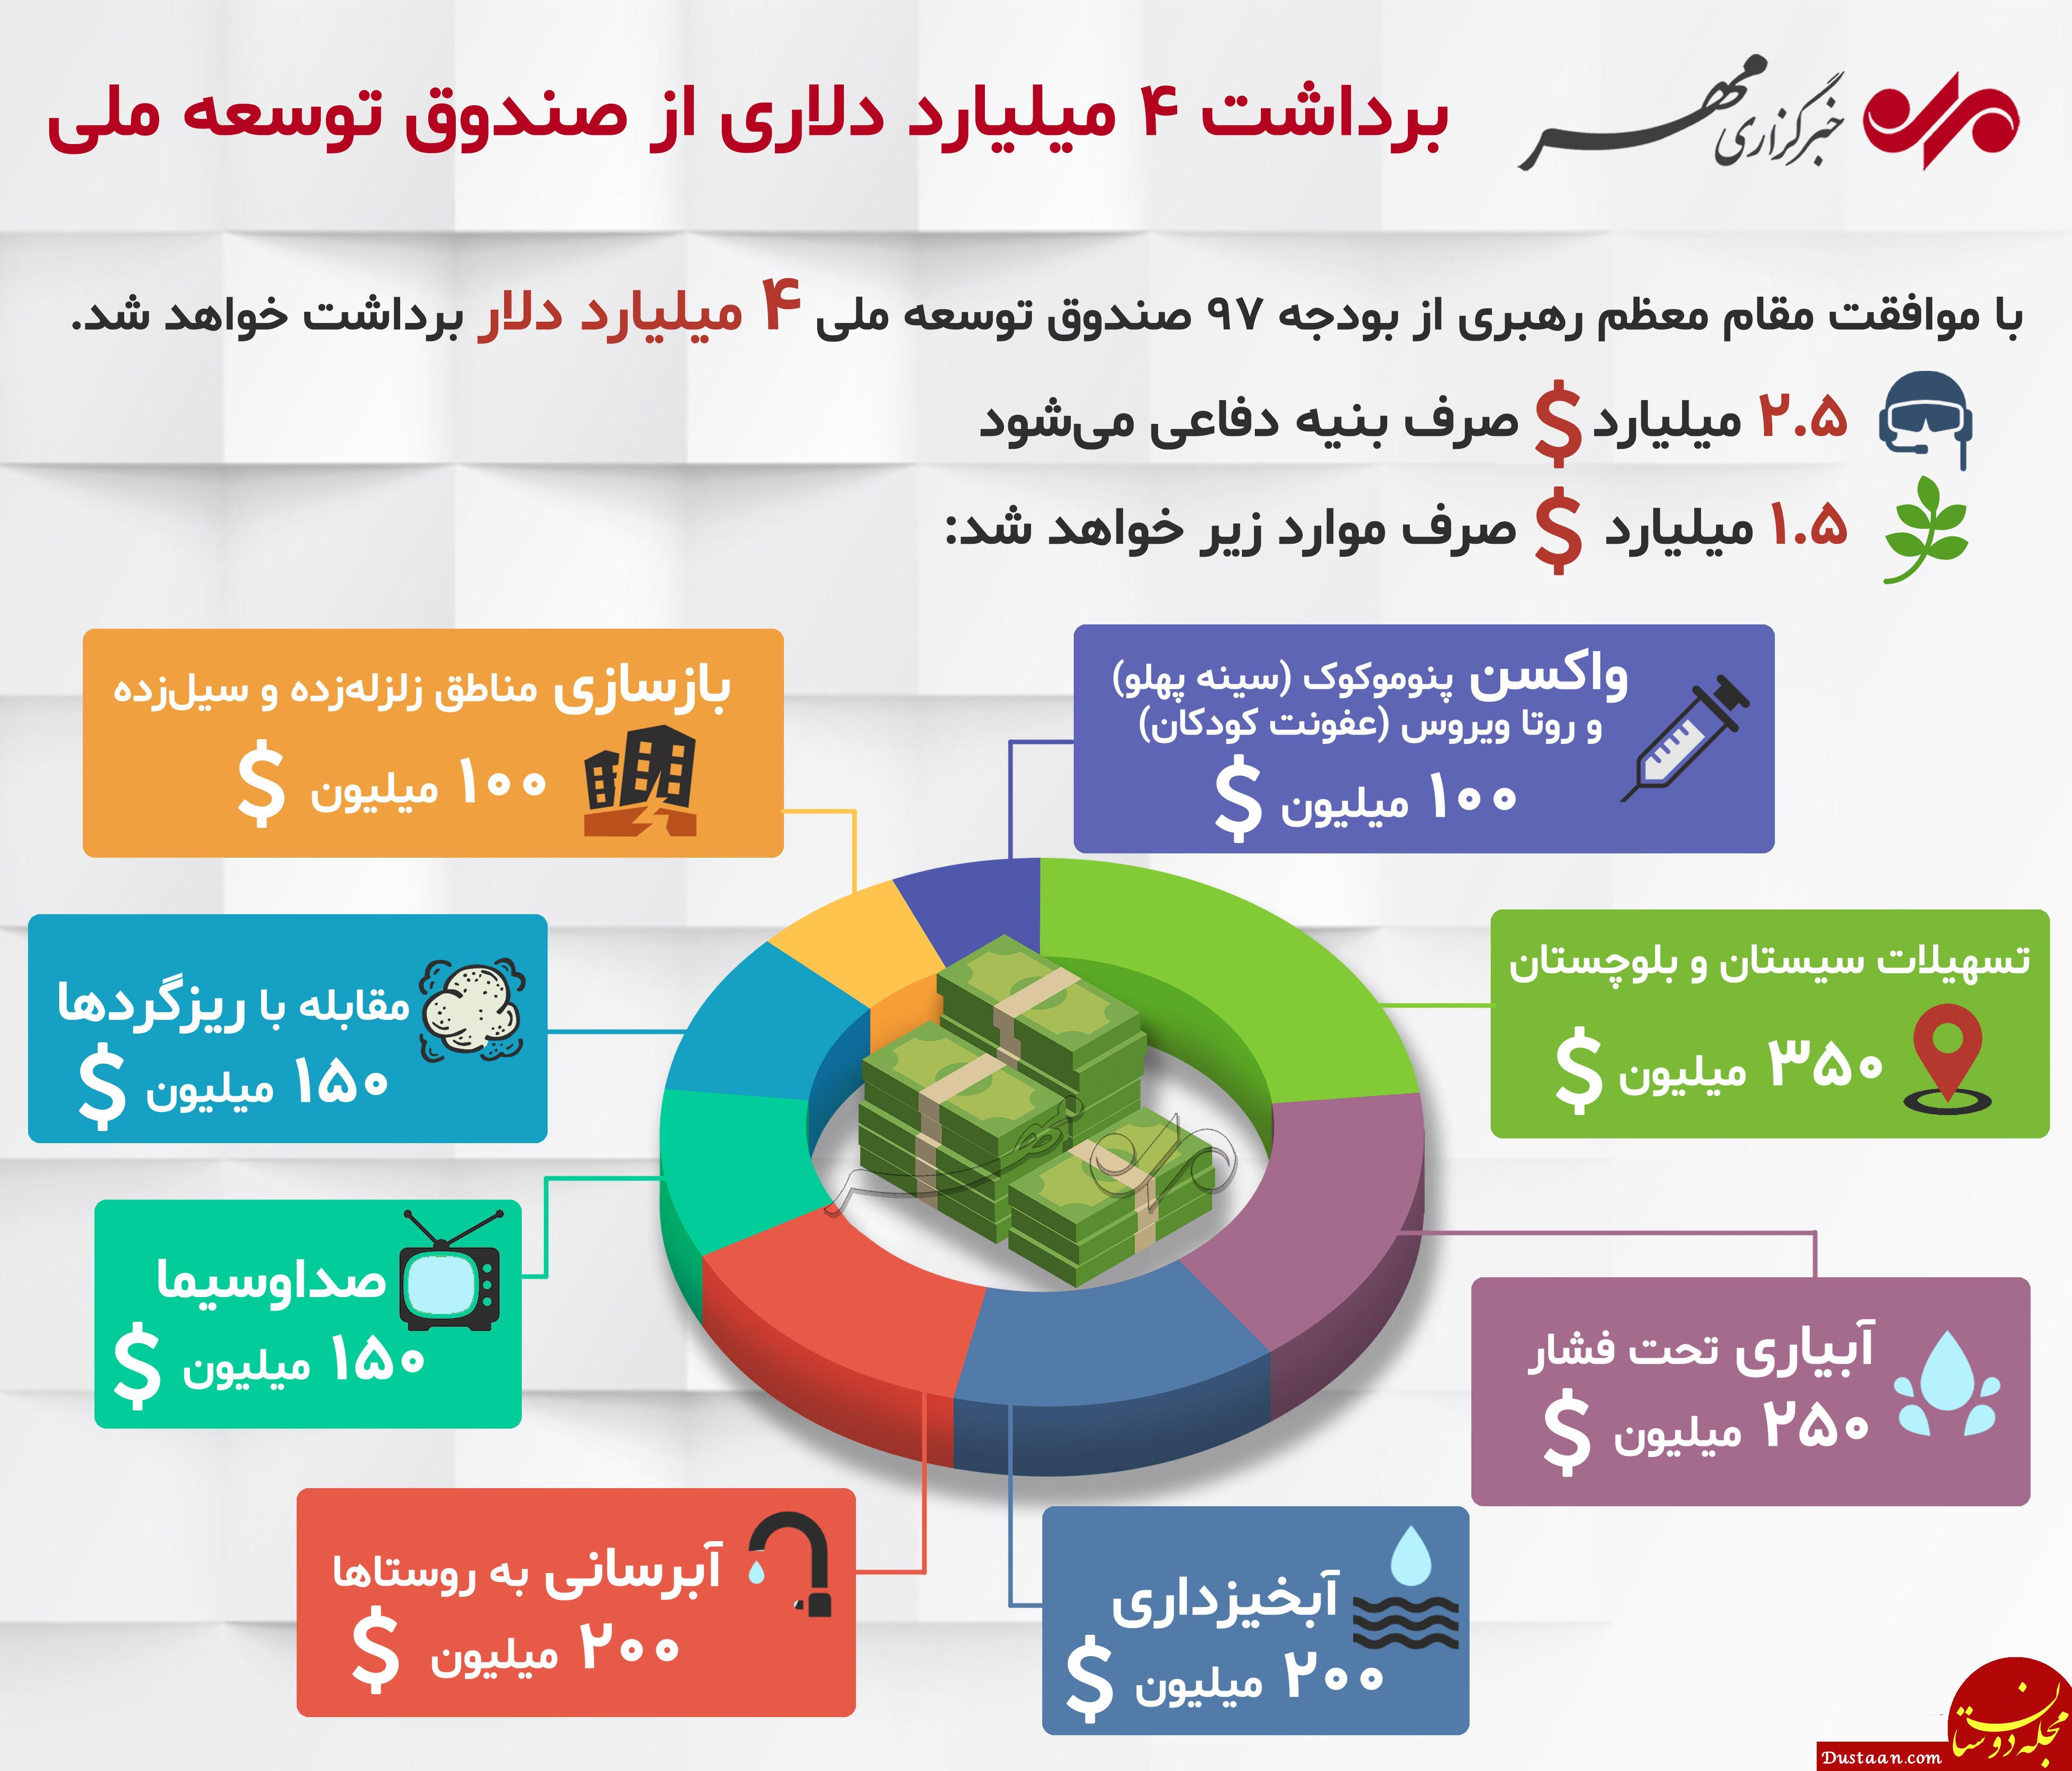 www.dustaan.com برداشت ۴ میلیارد دلاری از صندوق توسعه ملی +اینفوگرافیک